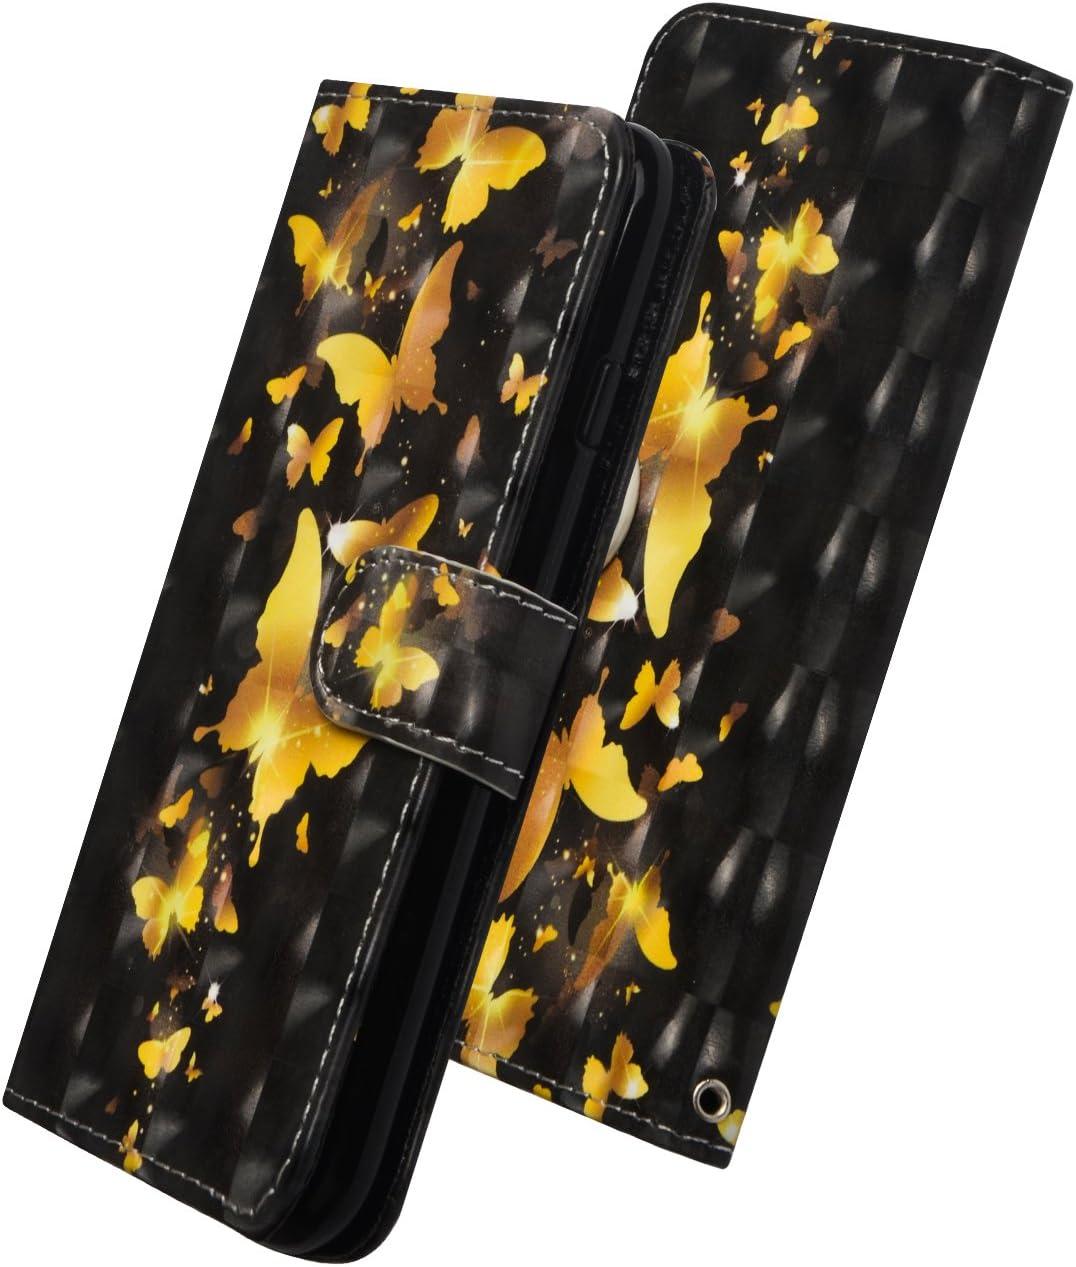 MRSTER Funda para LG K40s 3D Brillos Carcasa Libro Flip Case Antigolpes Cartera PU Cuero Funda con Soporte para LG K40s YX 3D Peacock Flower